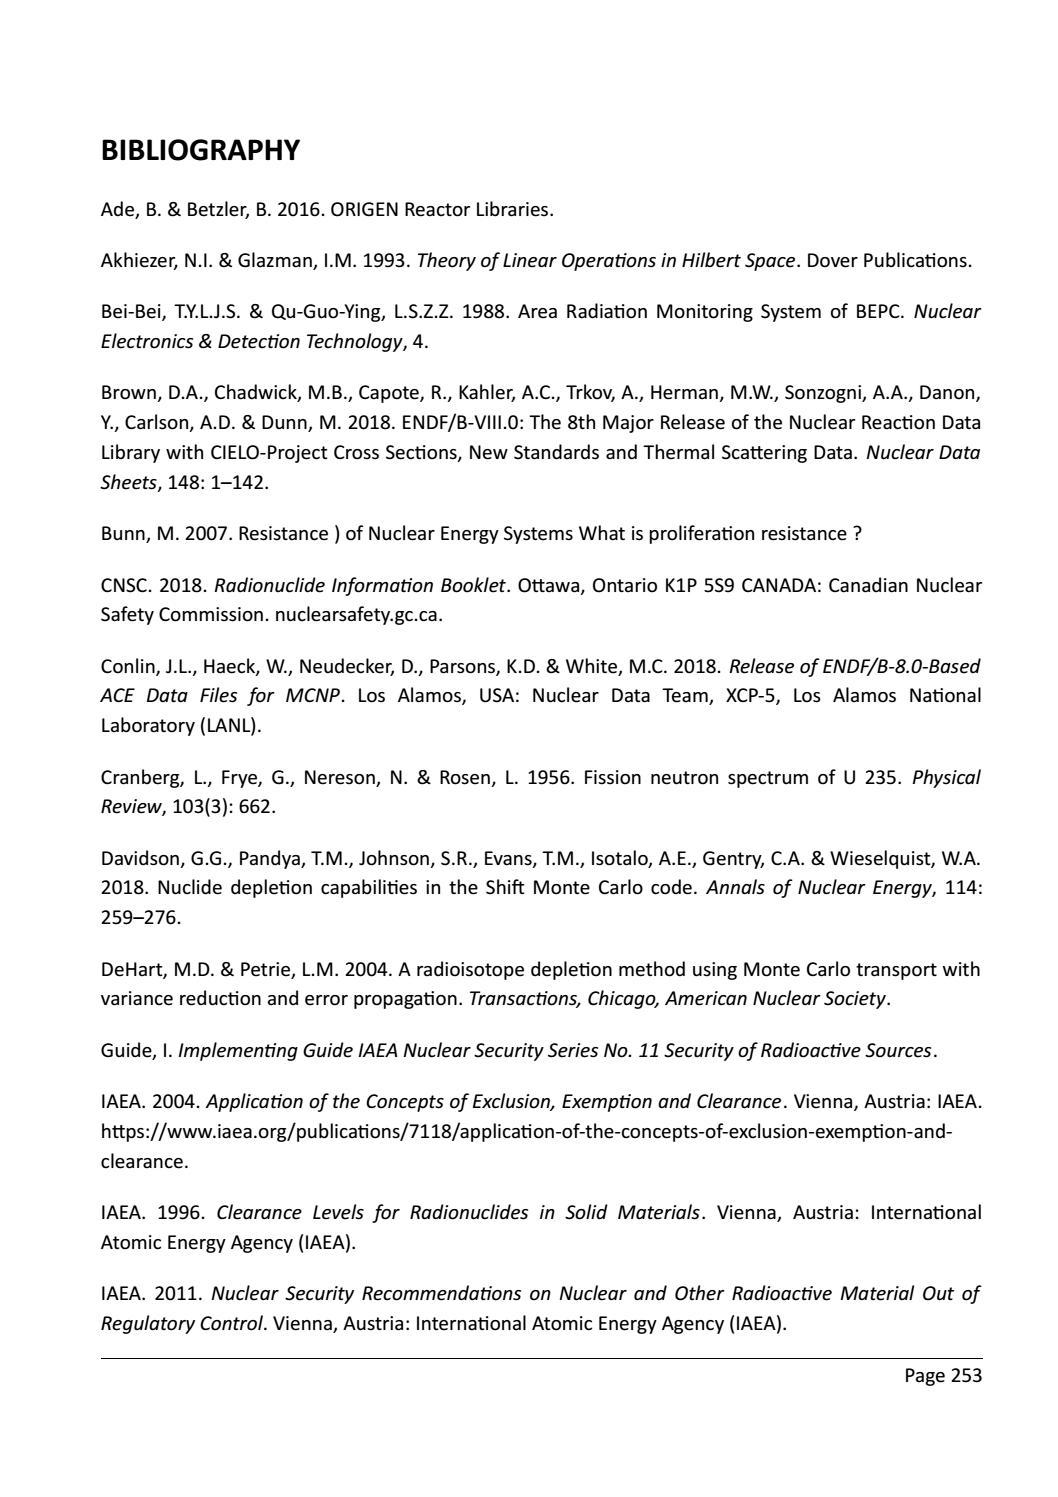 RADIOACTIVE WASTE: COMPUTATIONAL CHARACTERISATION and SHIELDING page 278